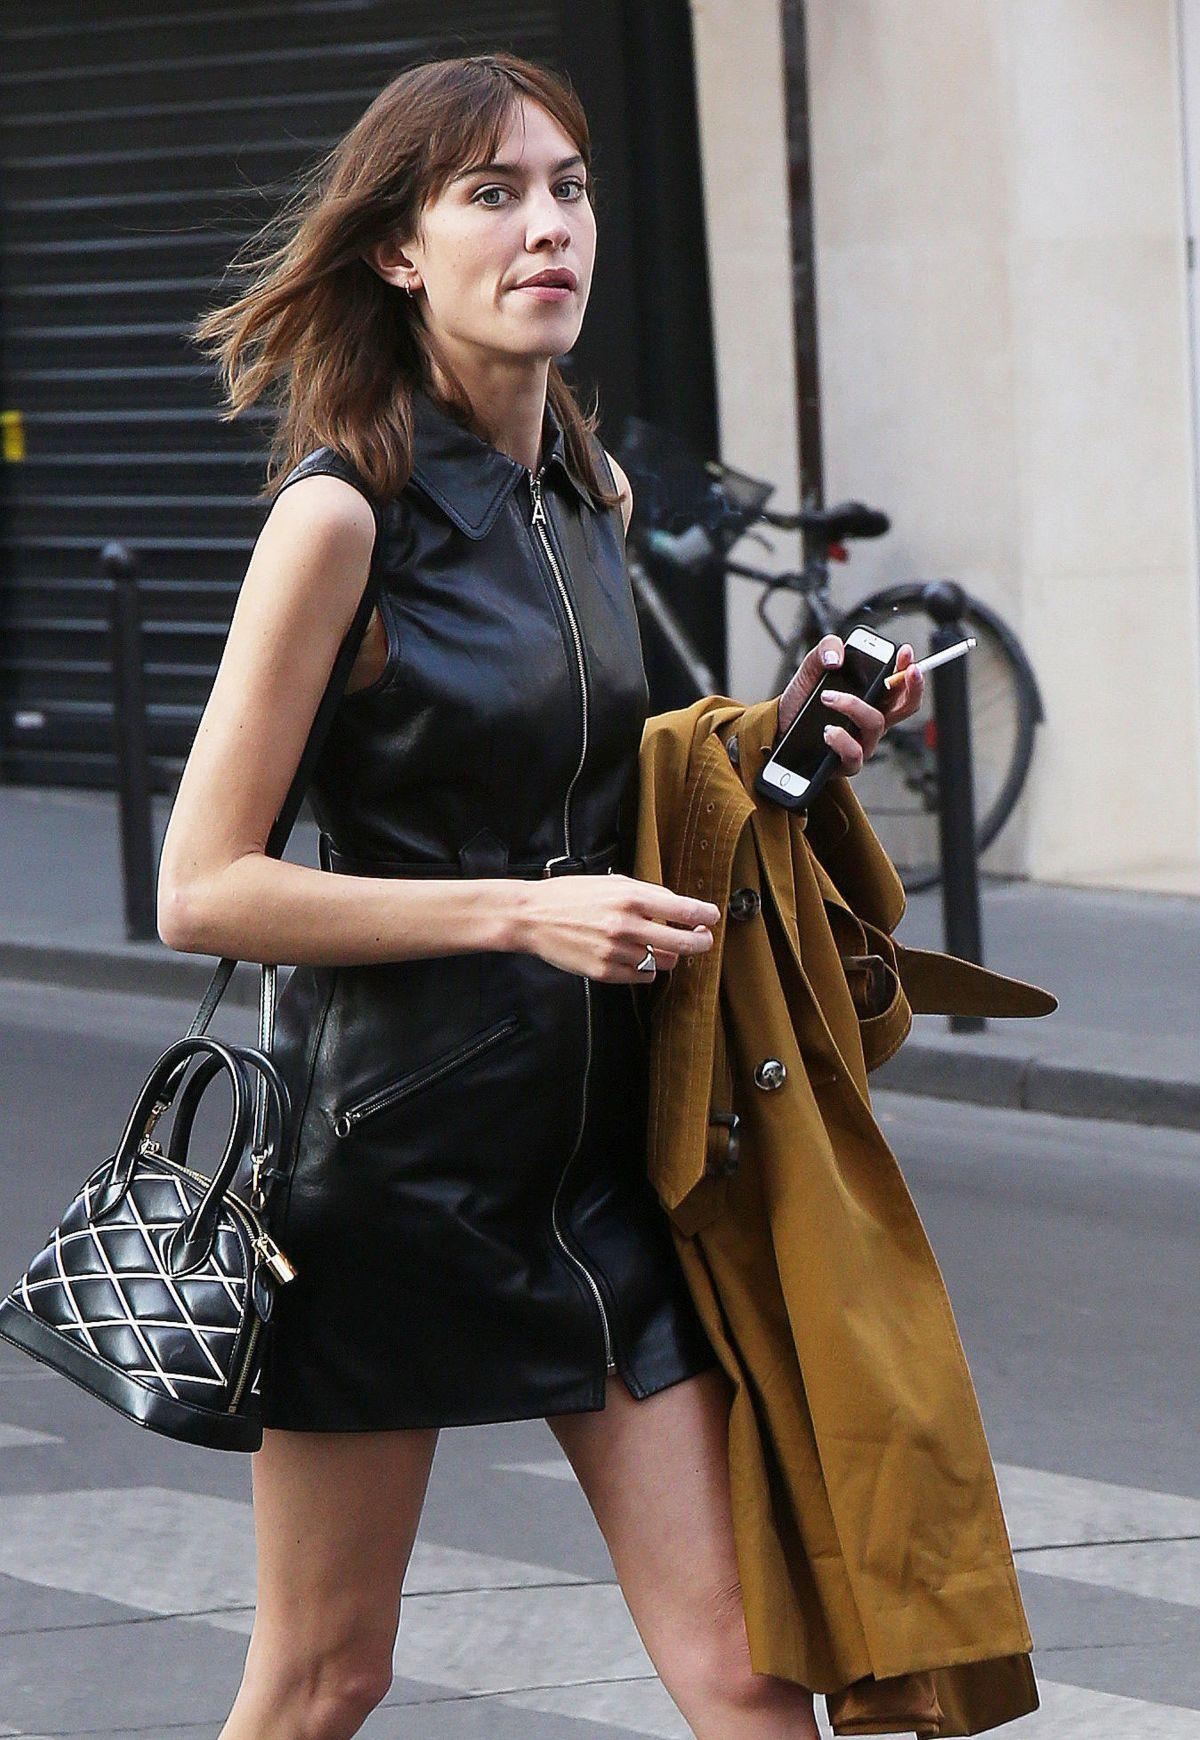 Alexa Chung Leaves Colette In Paris 06 01 2017